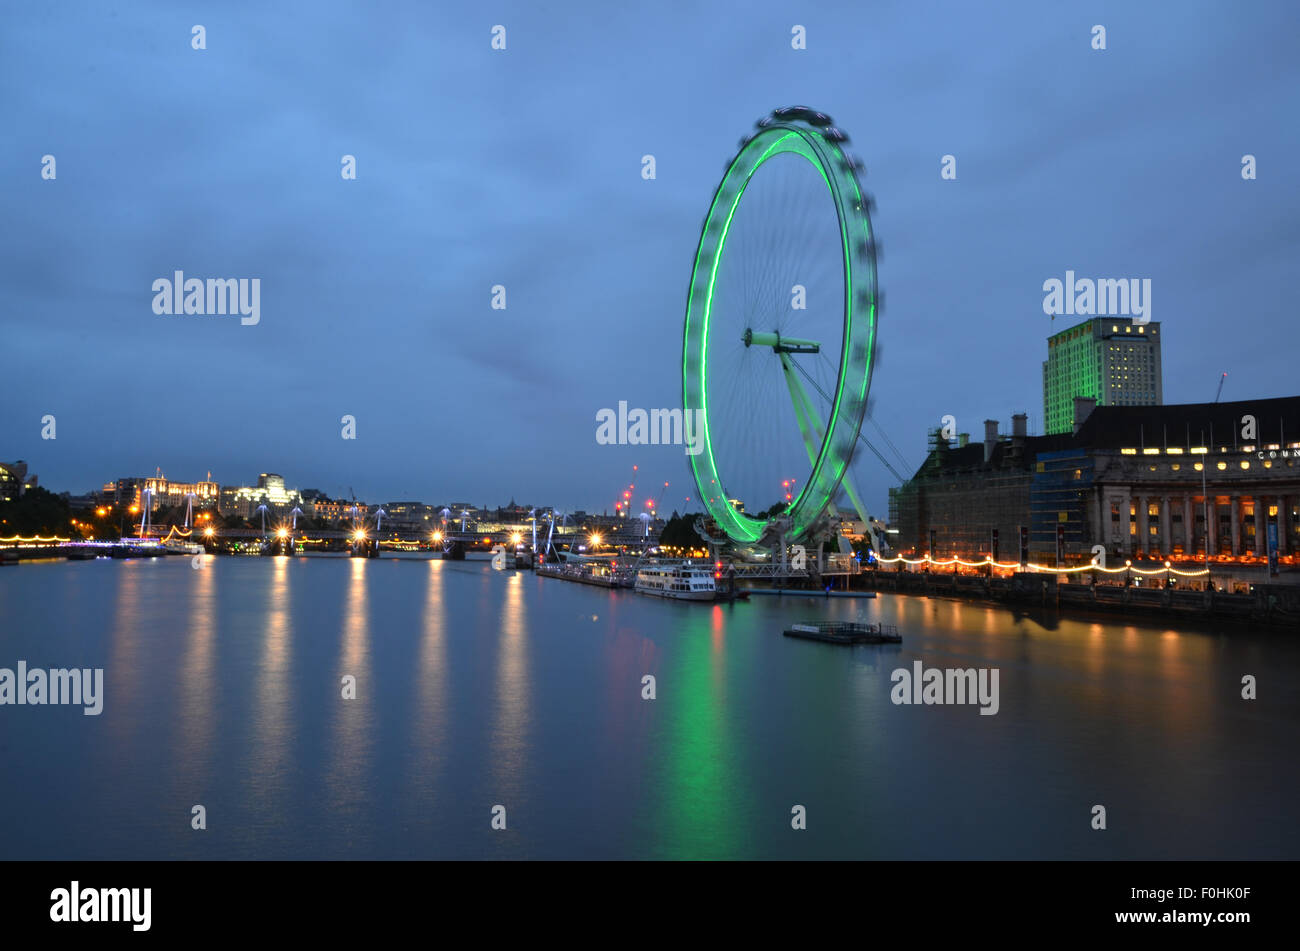 El Ojo de Londres, Londres, Reino Unido. Imagen De Stock